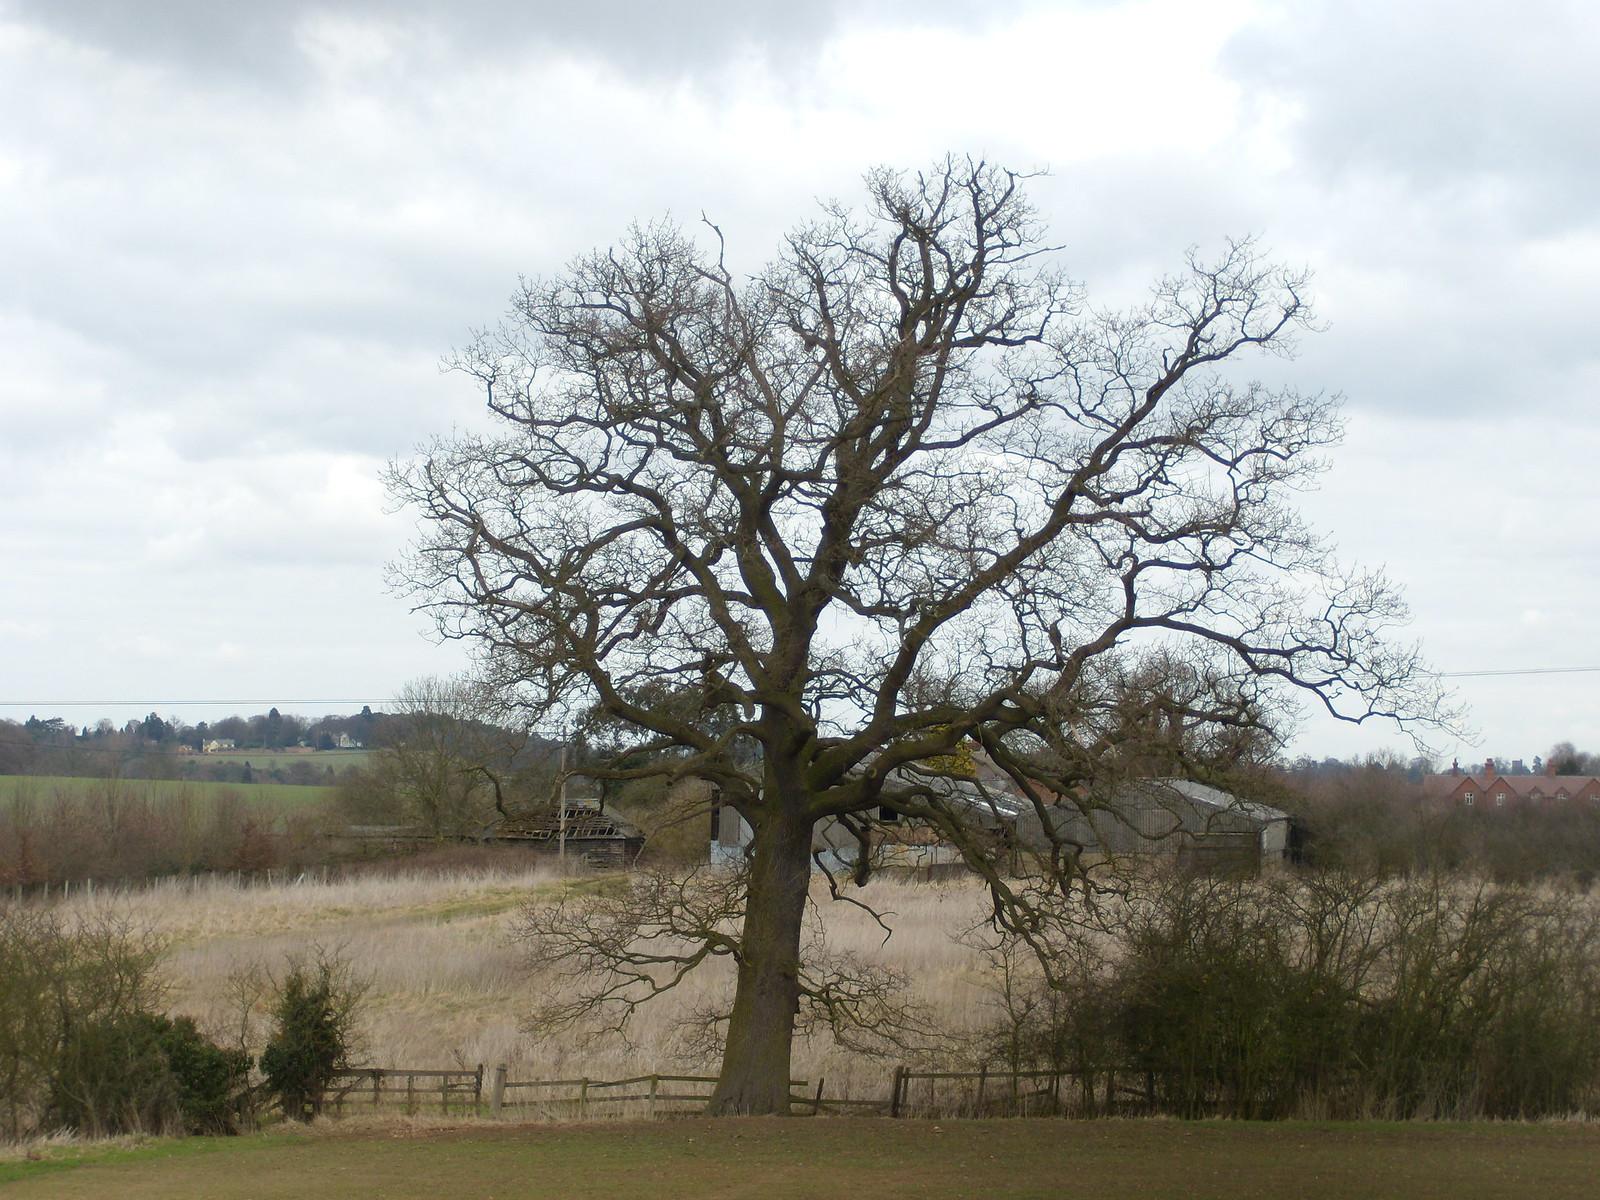 Impressive tree Bow Brickhill to Woburn Sands